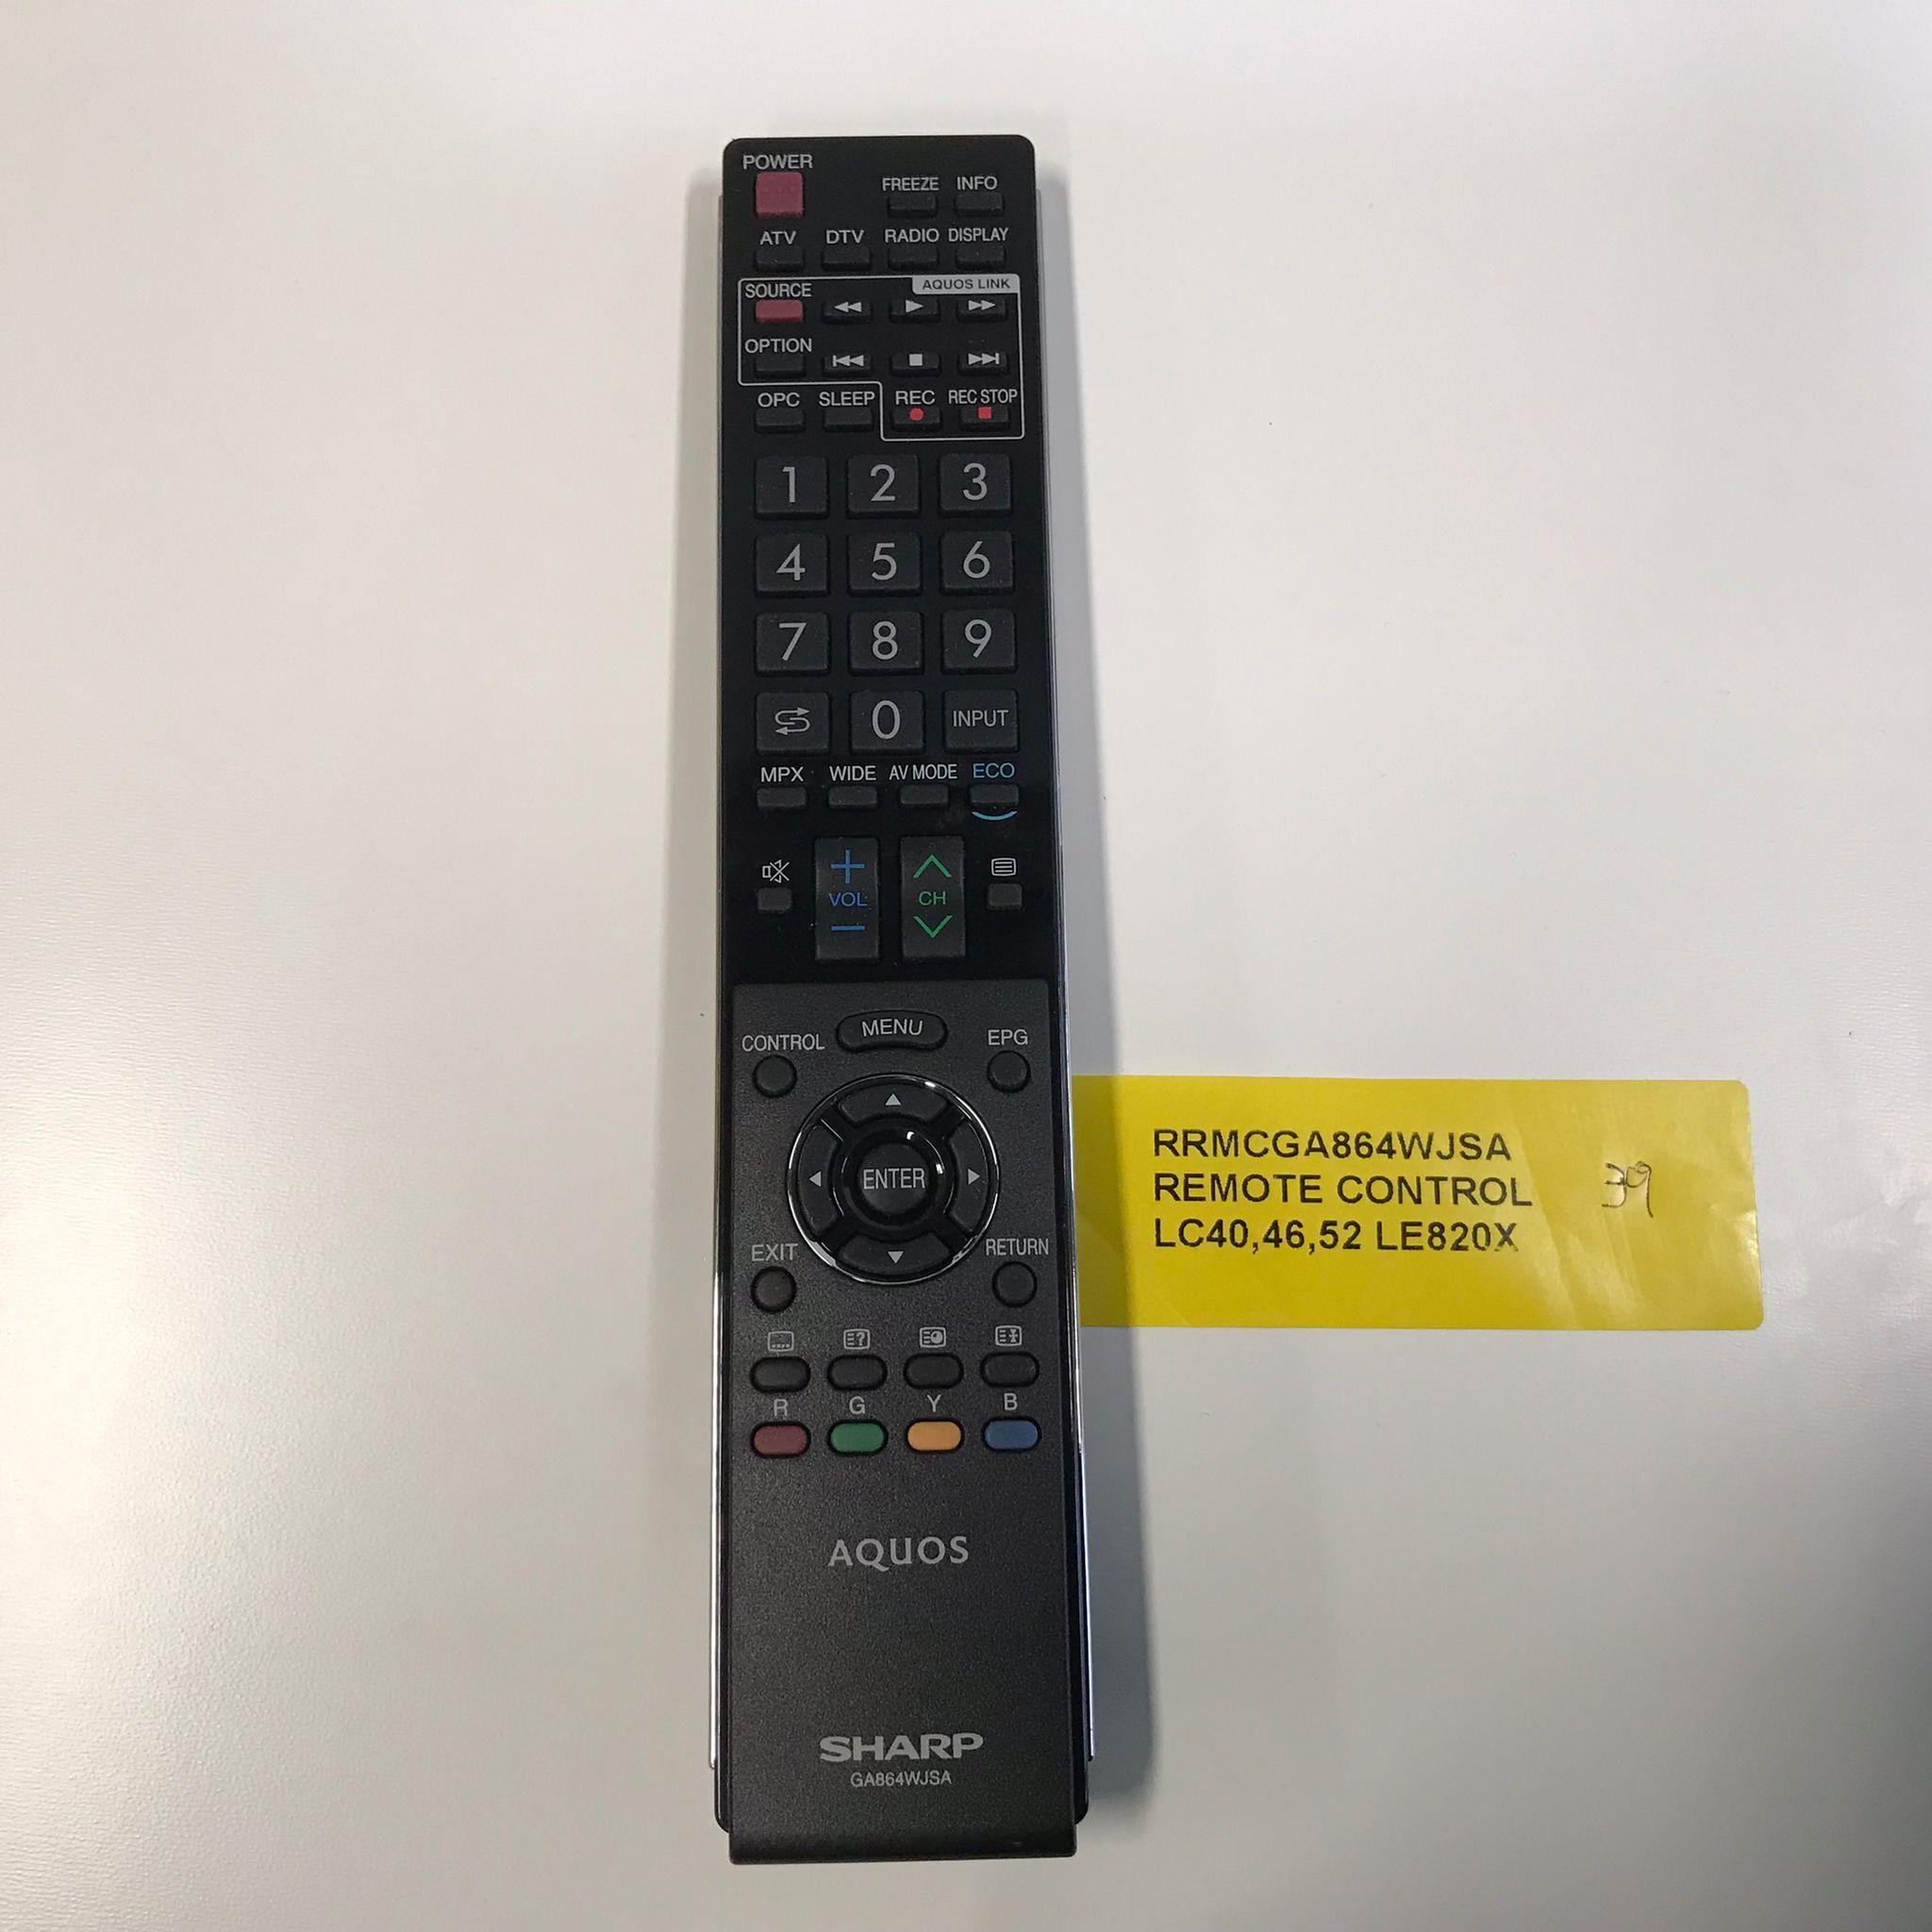 Sharp TV Remote Control RRMCGA864WJSA